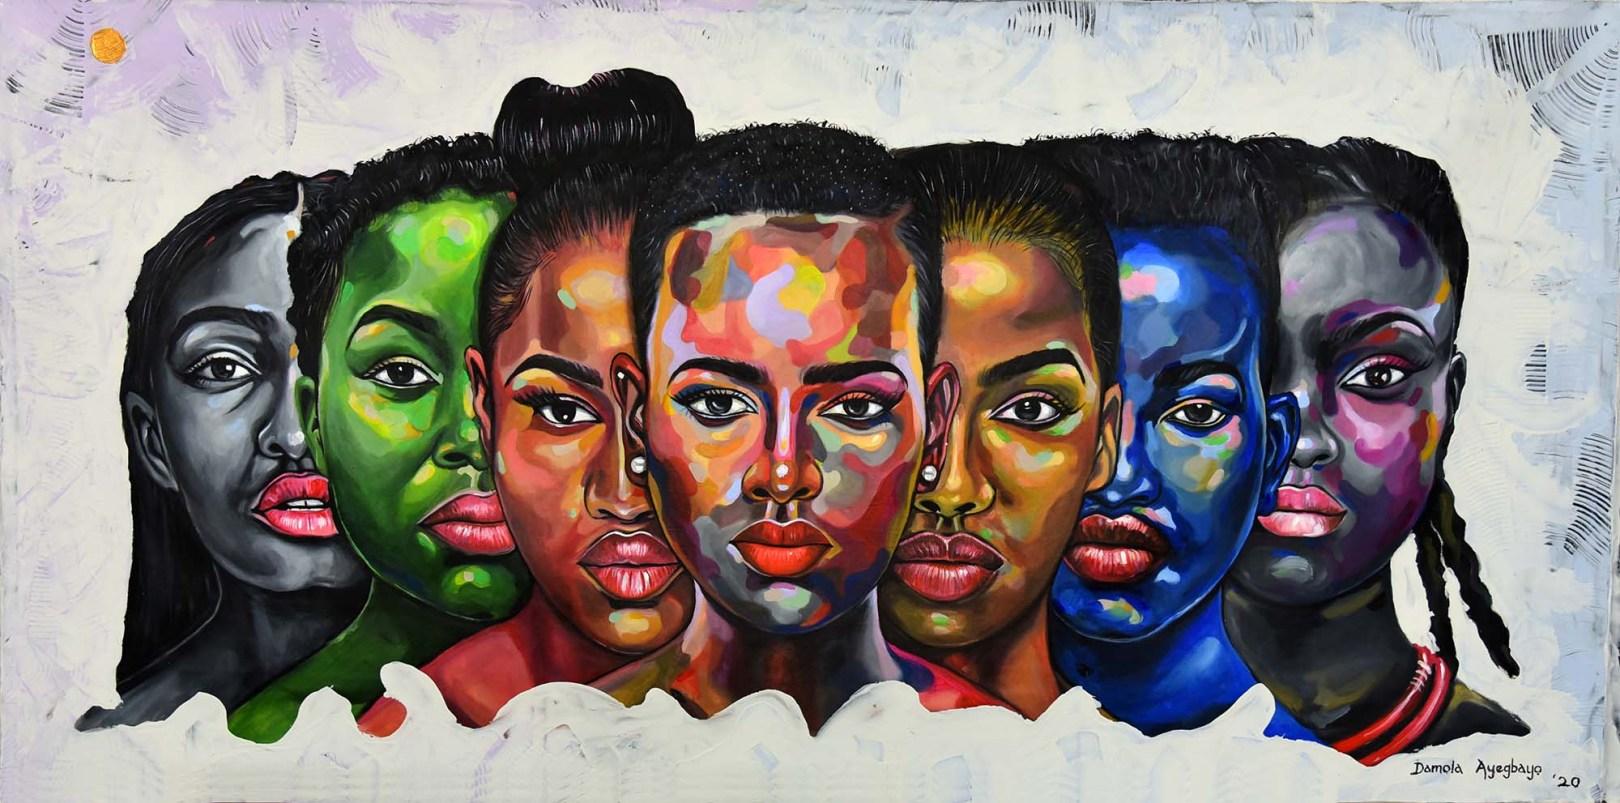 Black people and Black artist celebrated